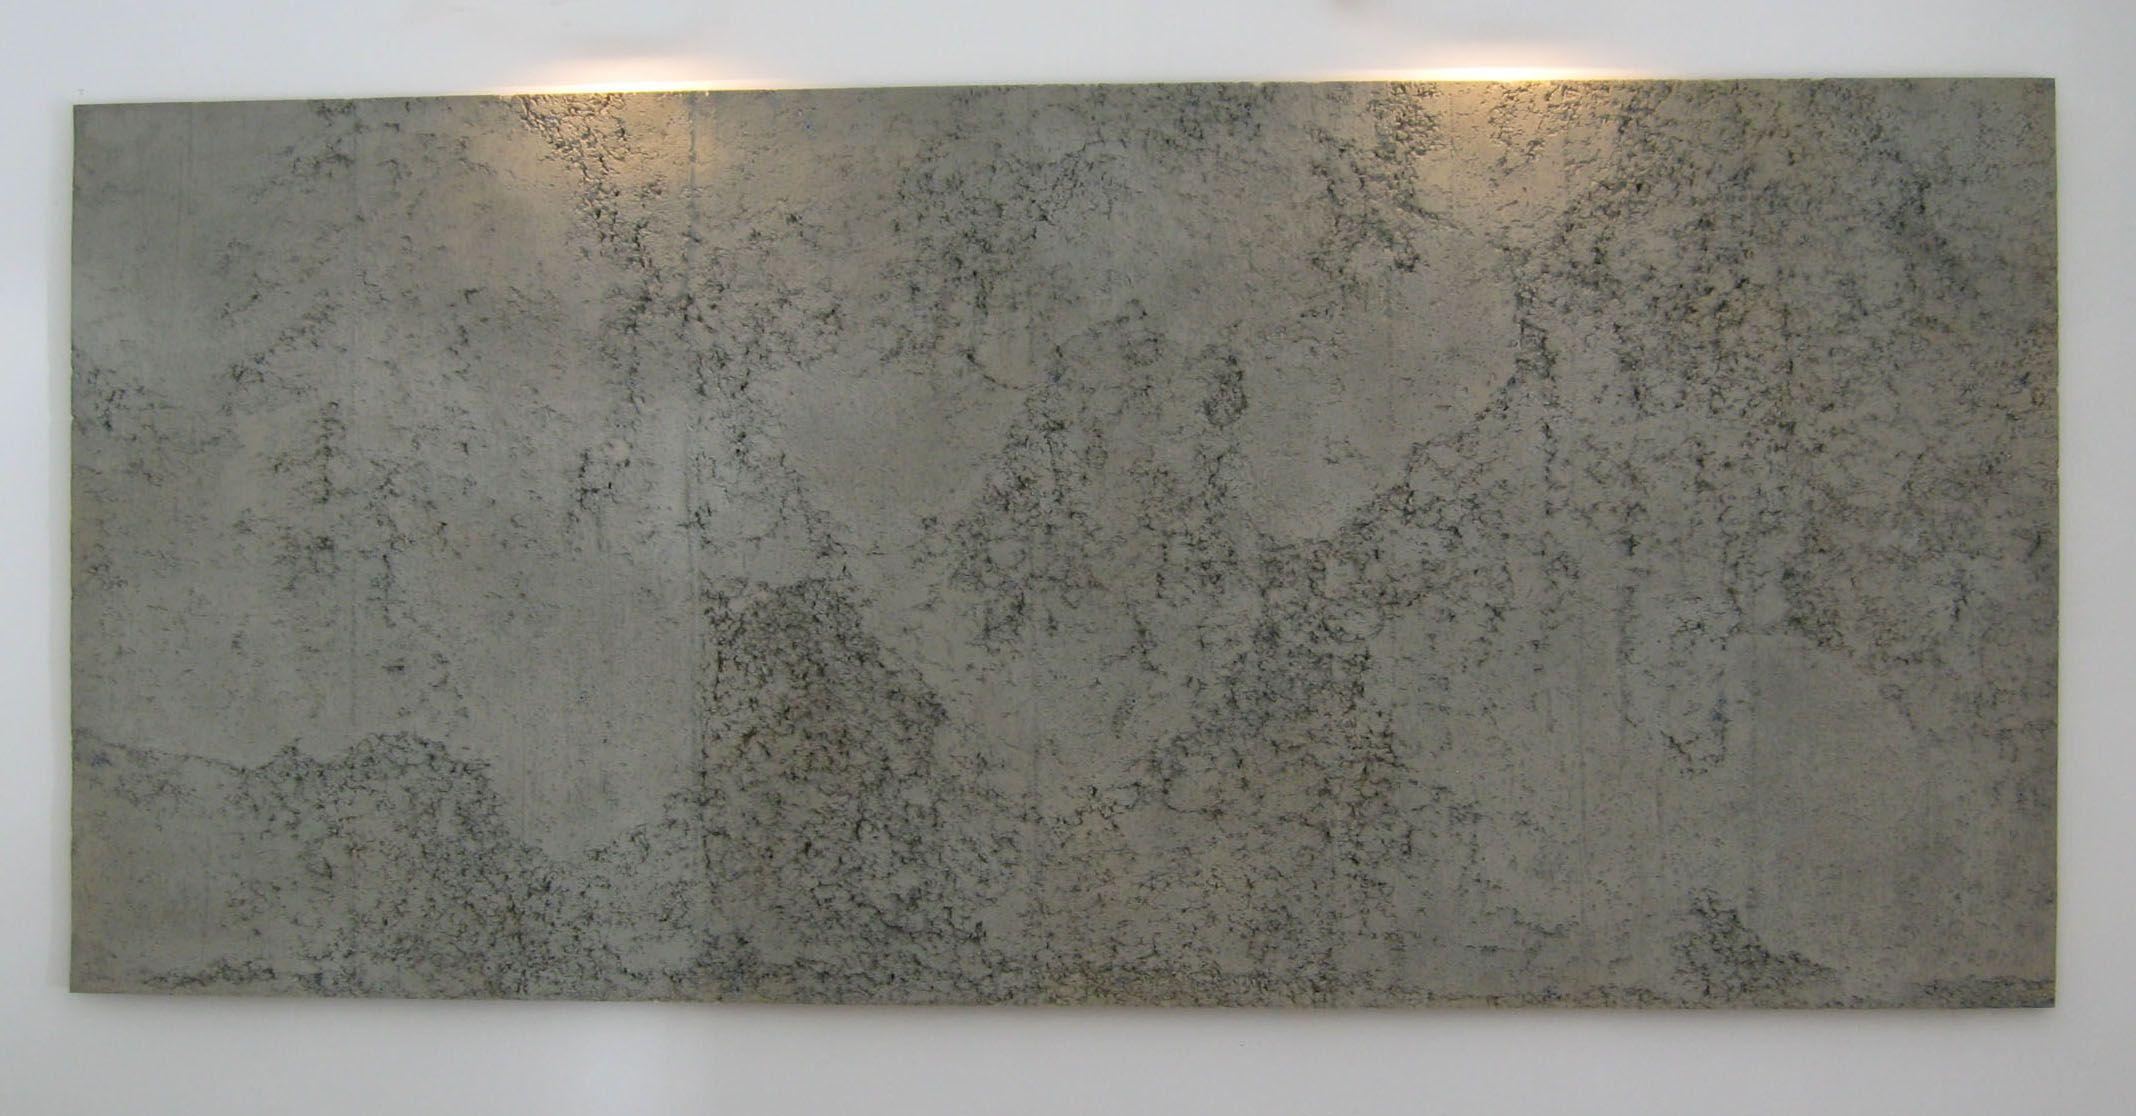 M177 Rustic Concrete Wall Panel